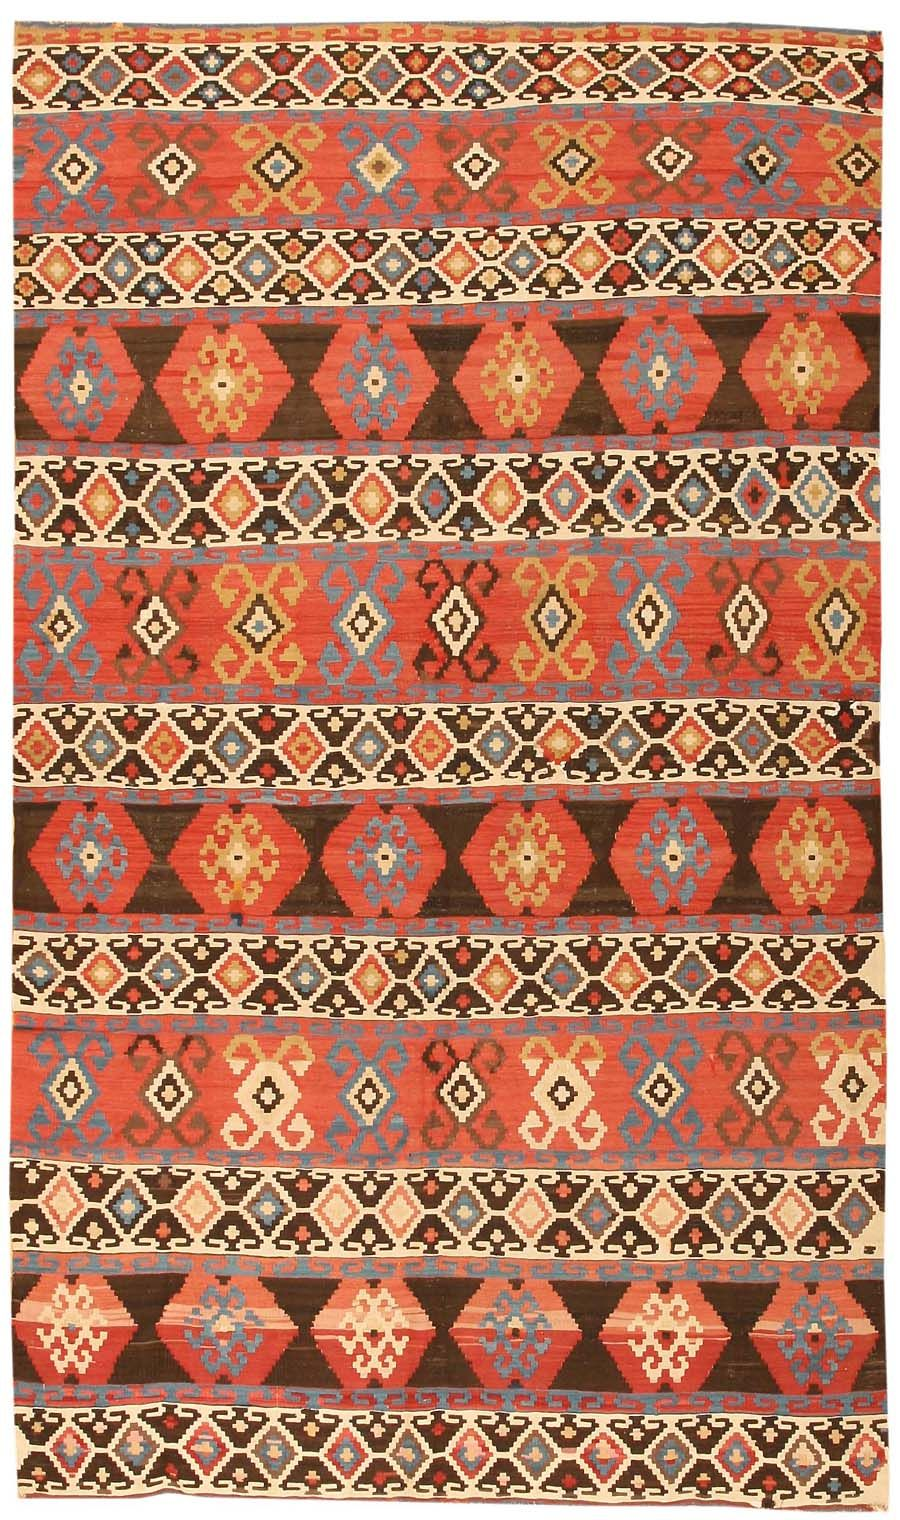 Patterns Kid Boho Chic Pattern Bohemian Interiors Fabrics And Frames Furniture